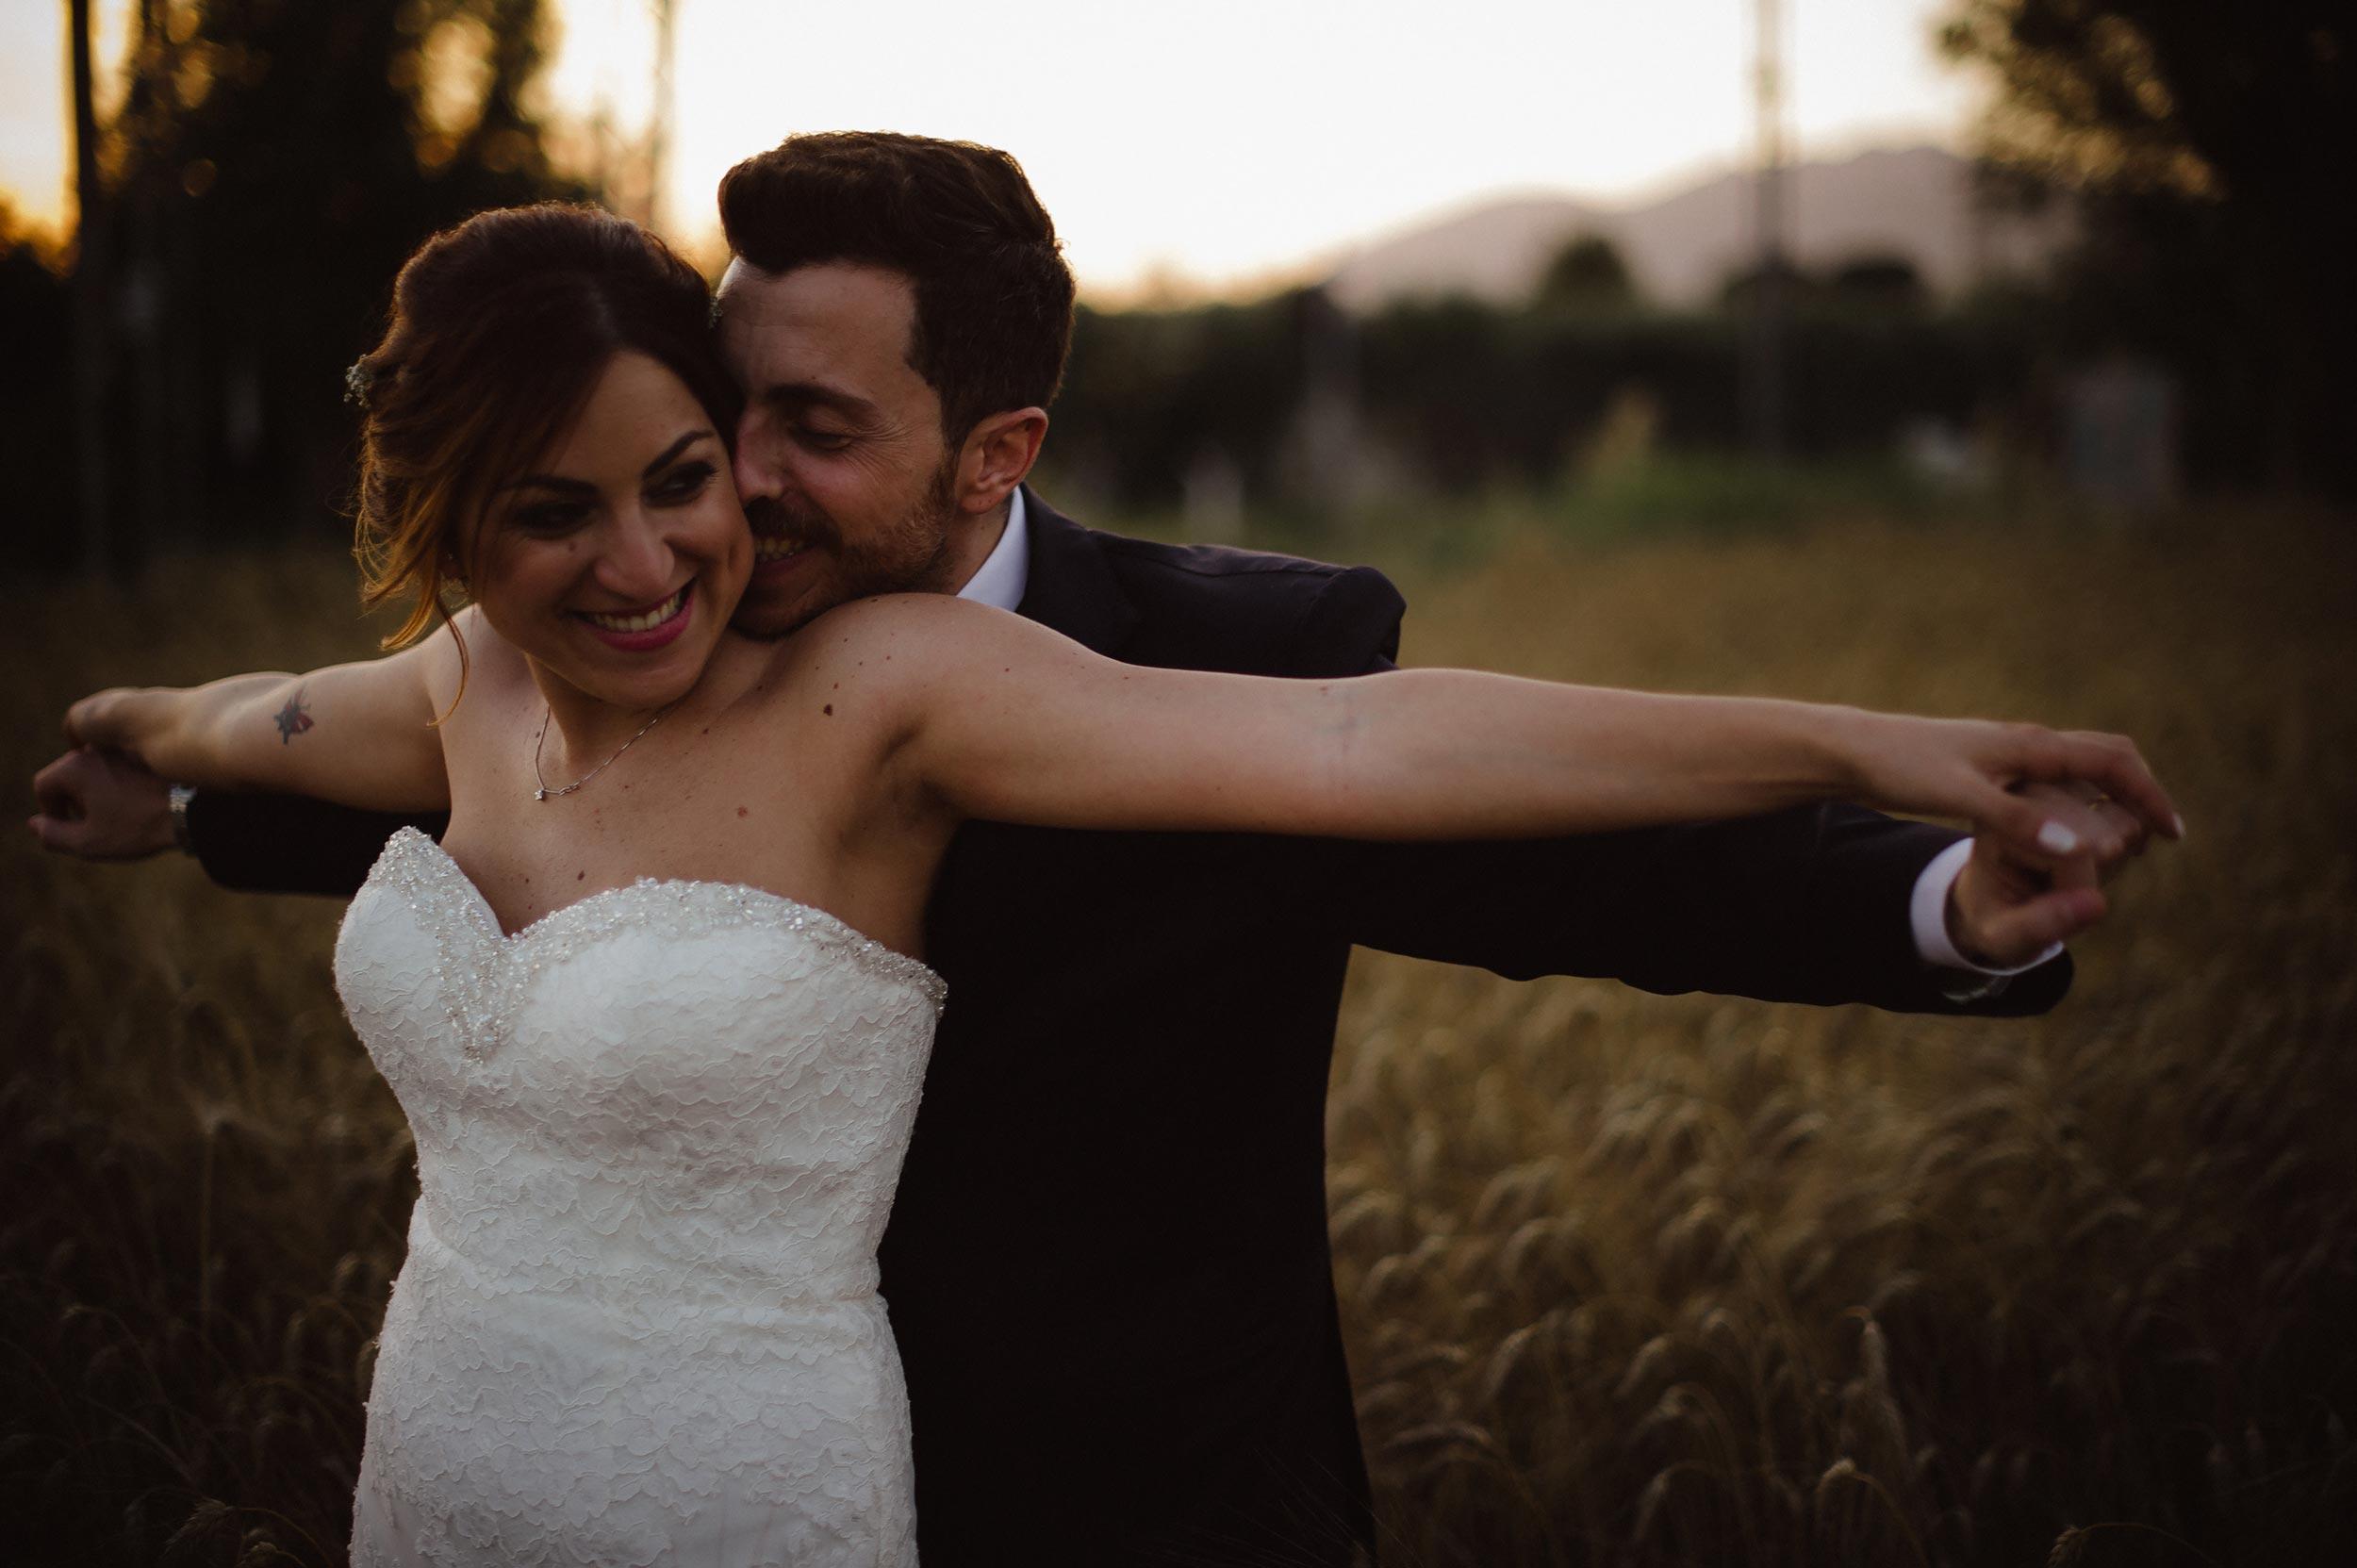 2016-Claudio-Teresa-Naples-Wedding-Photographer-Italy-Alessandro-Avenali-83.jpg